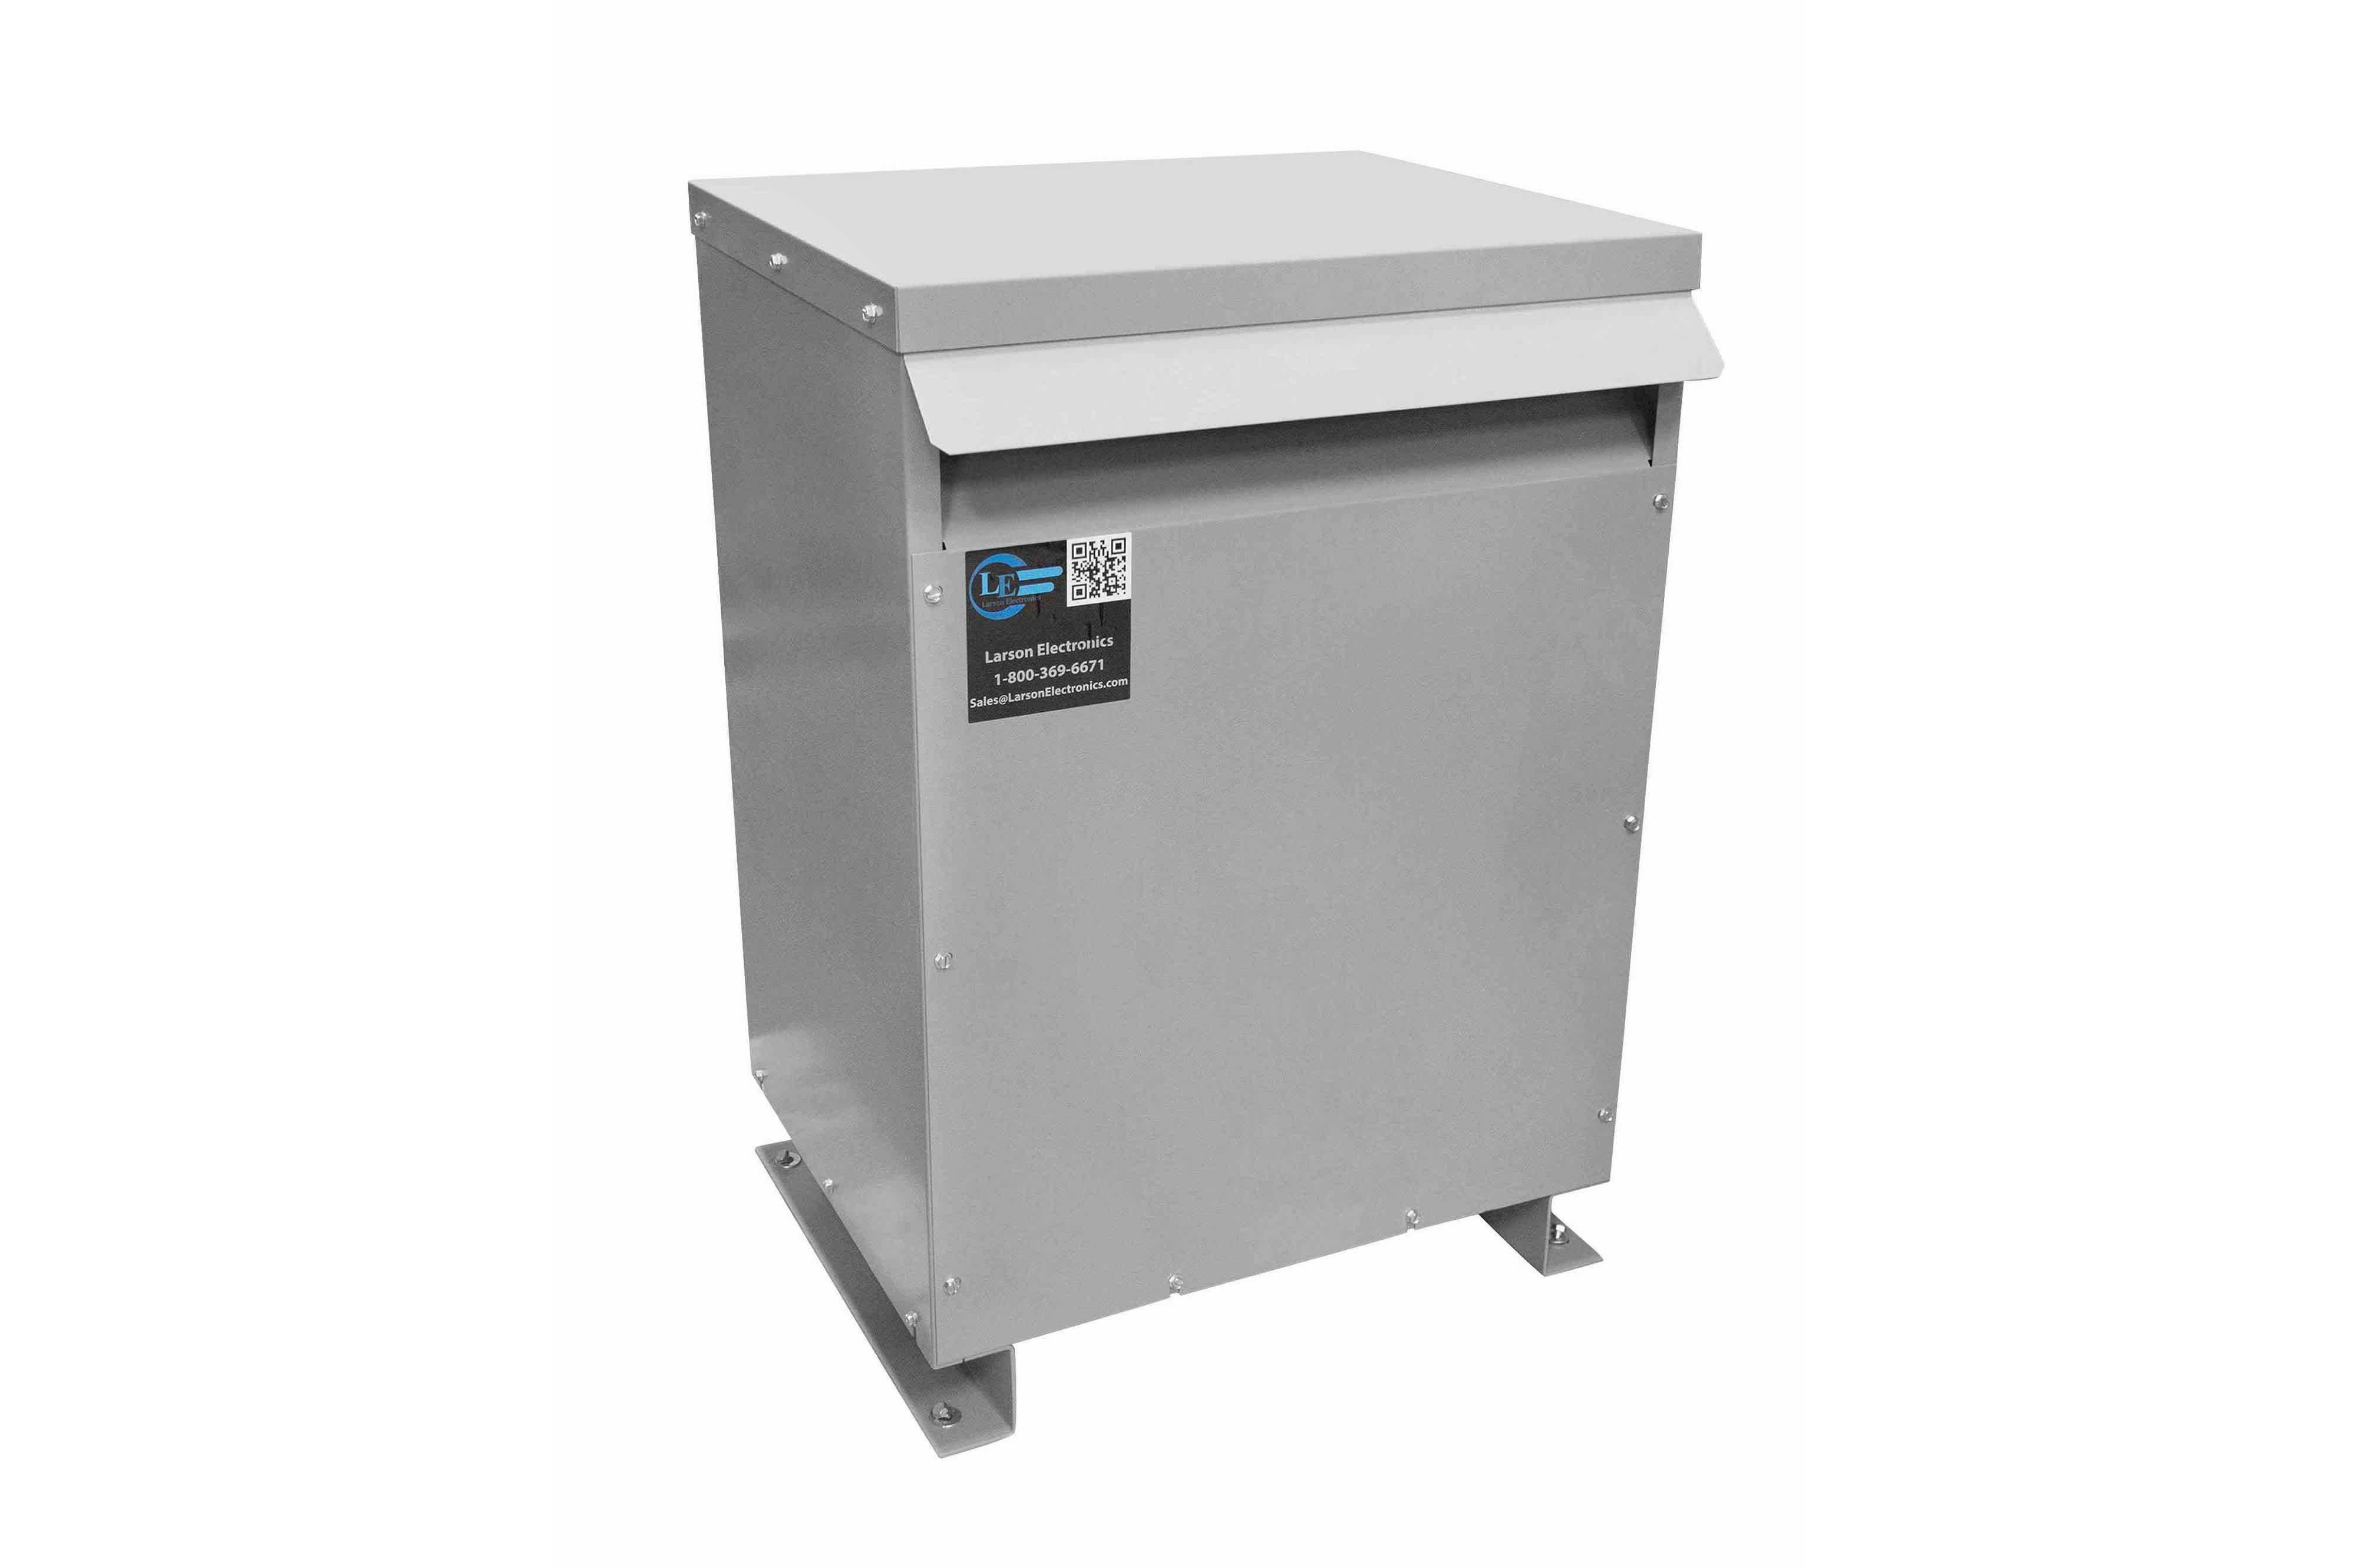 32.5 kVA 3PH Isolation Transformer, 240V Wye Primary, 415Y/240 Wye-N Secondary, N3R, Ventilated, 60 Hz